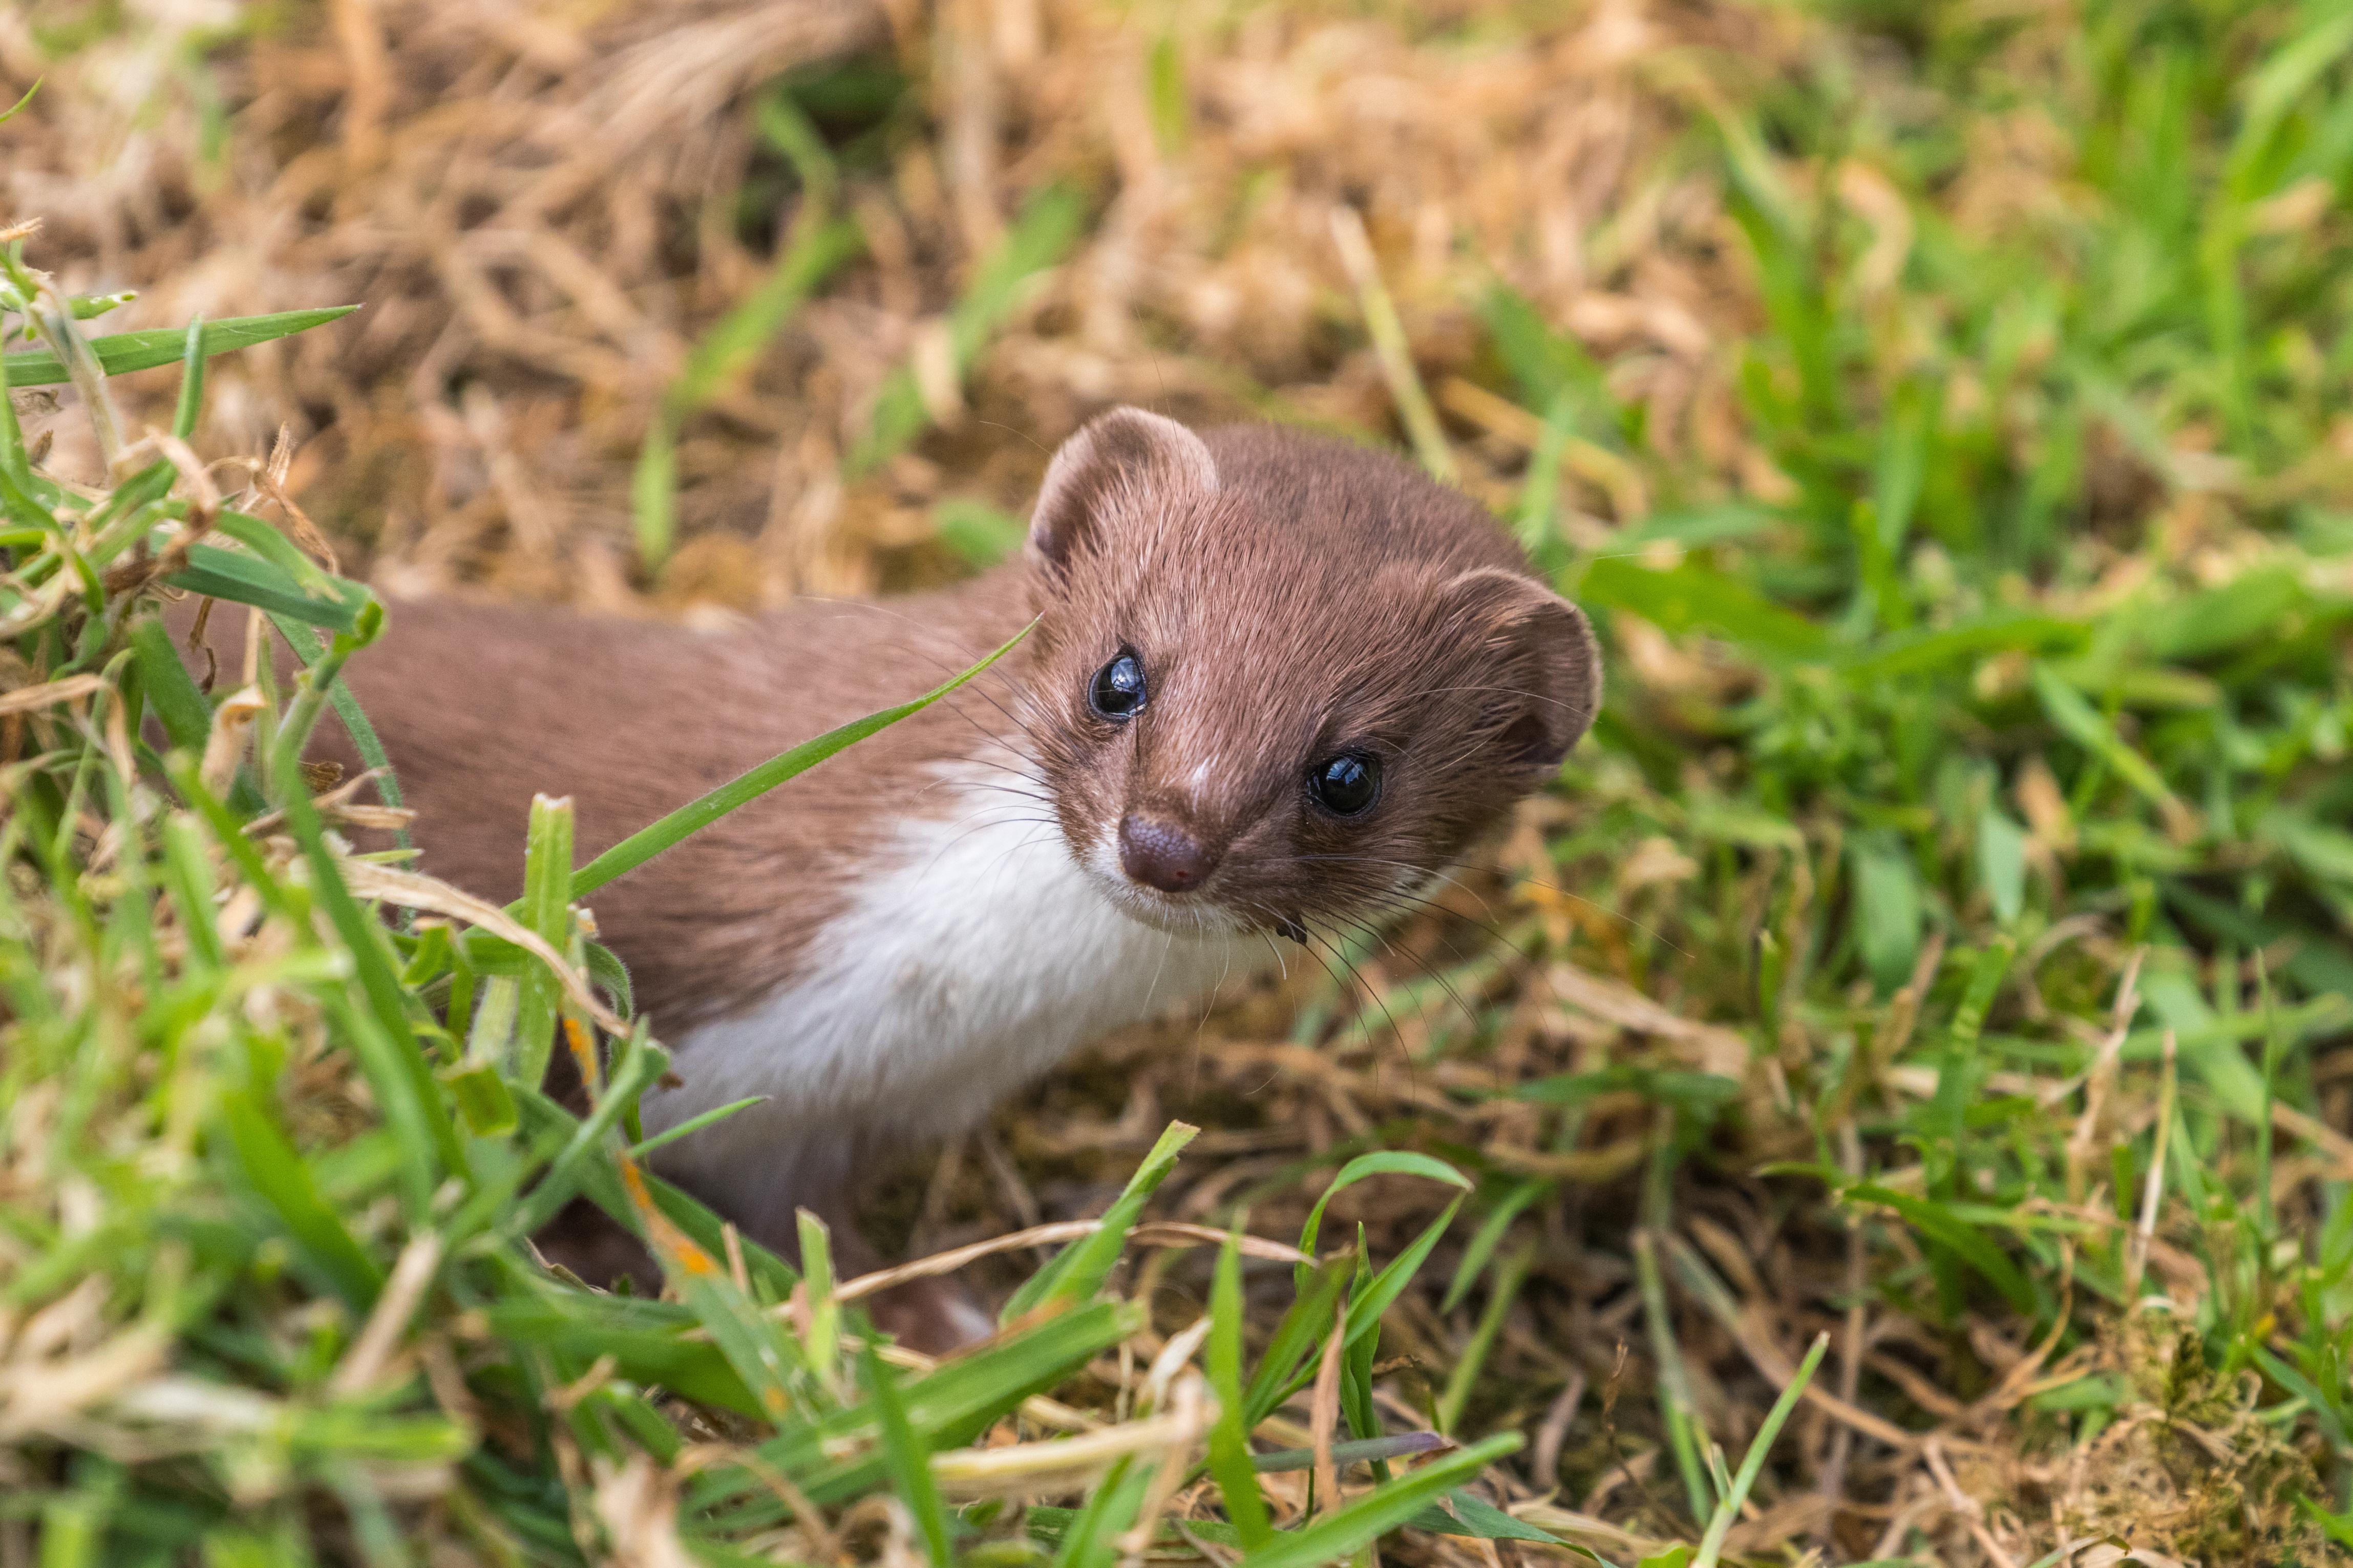 Weasel or Least weasel (mustela nivalis) on a grass bank